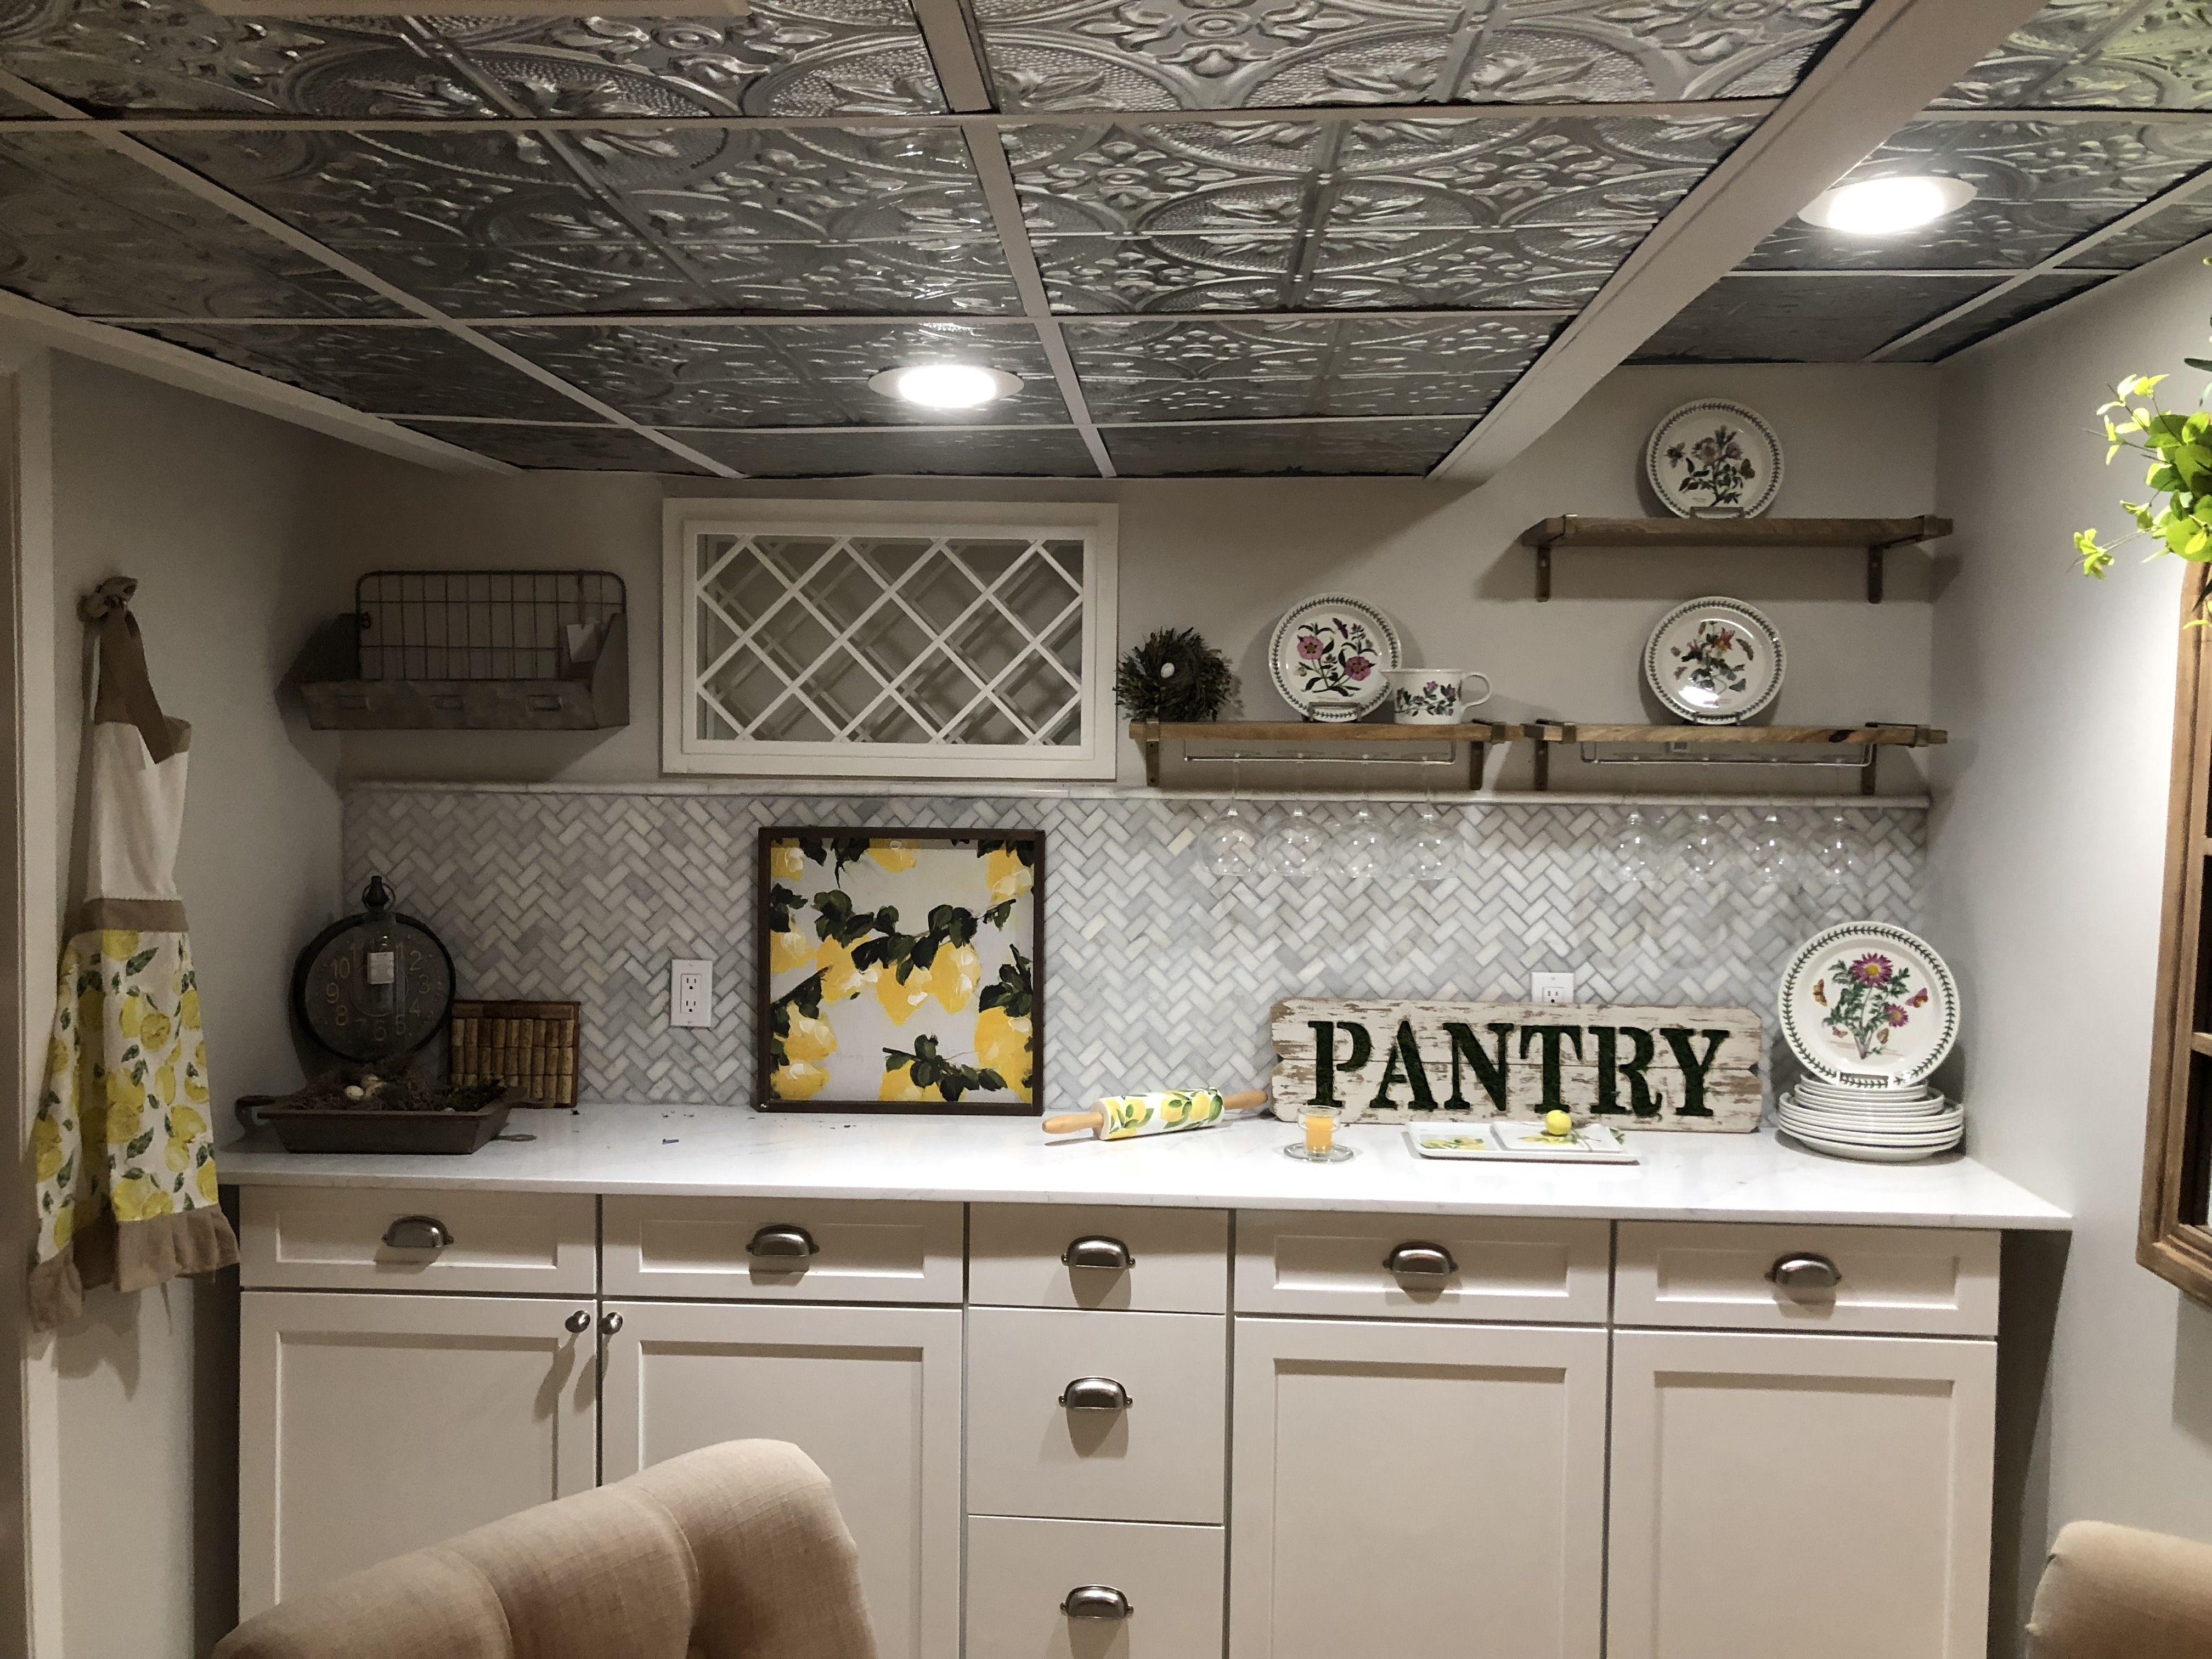 Basement, Tin Ceiling, Herringbone Marble Backsplash, Open Wood Shelves, Wine